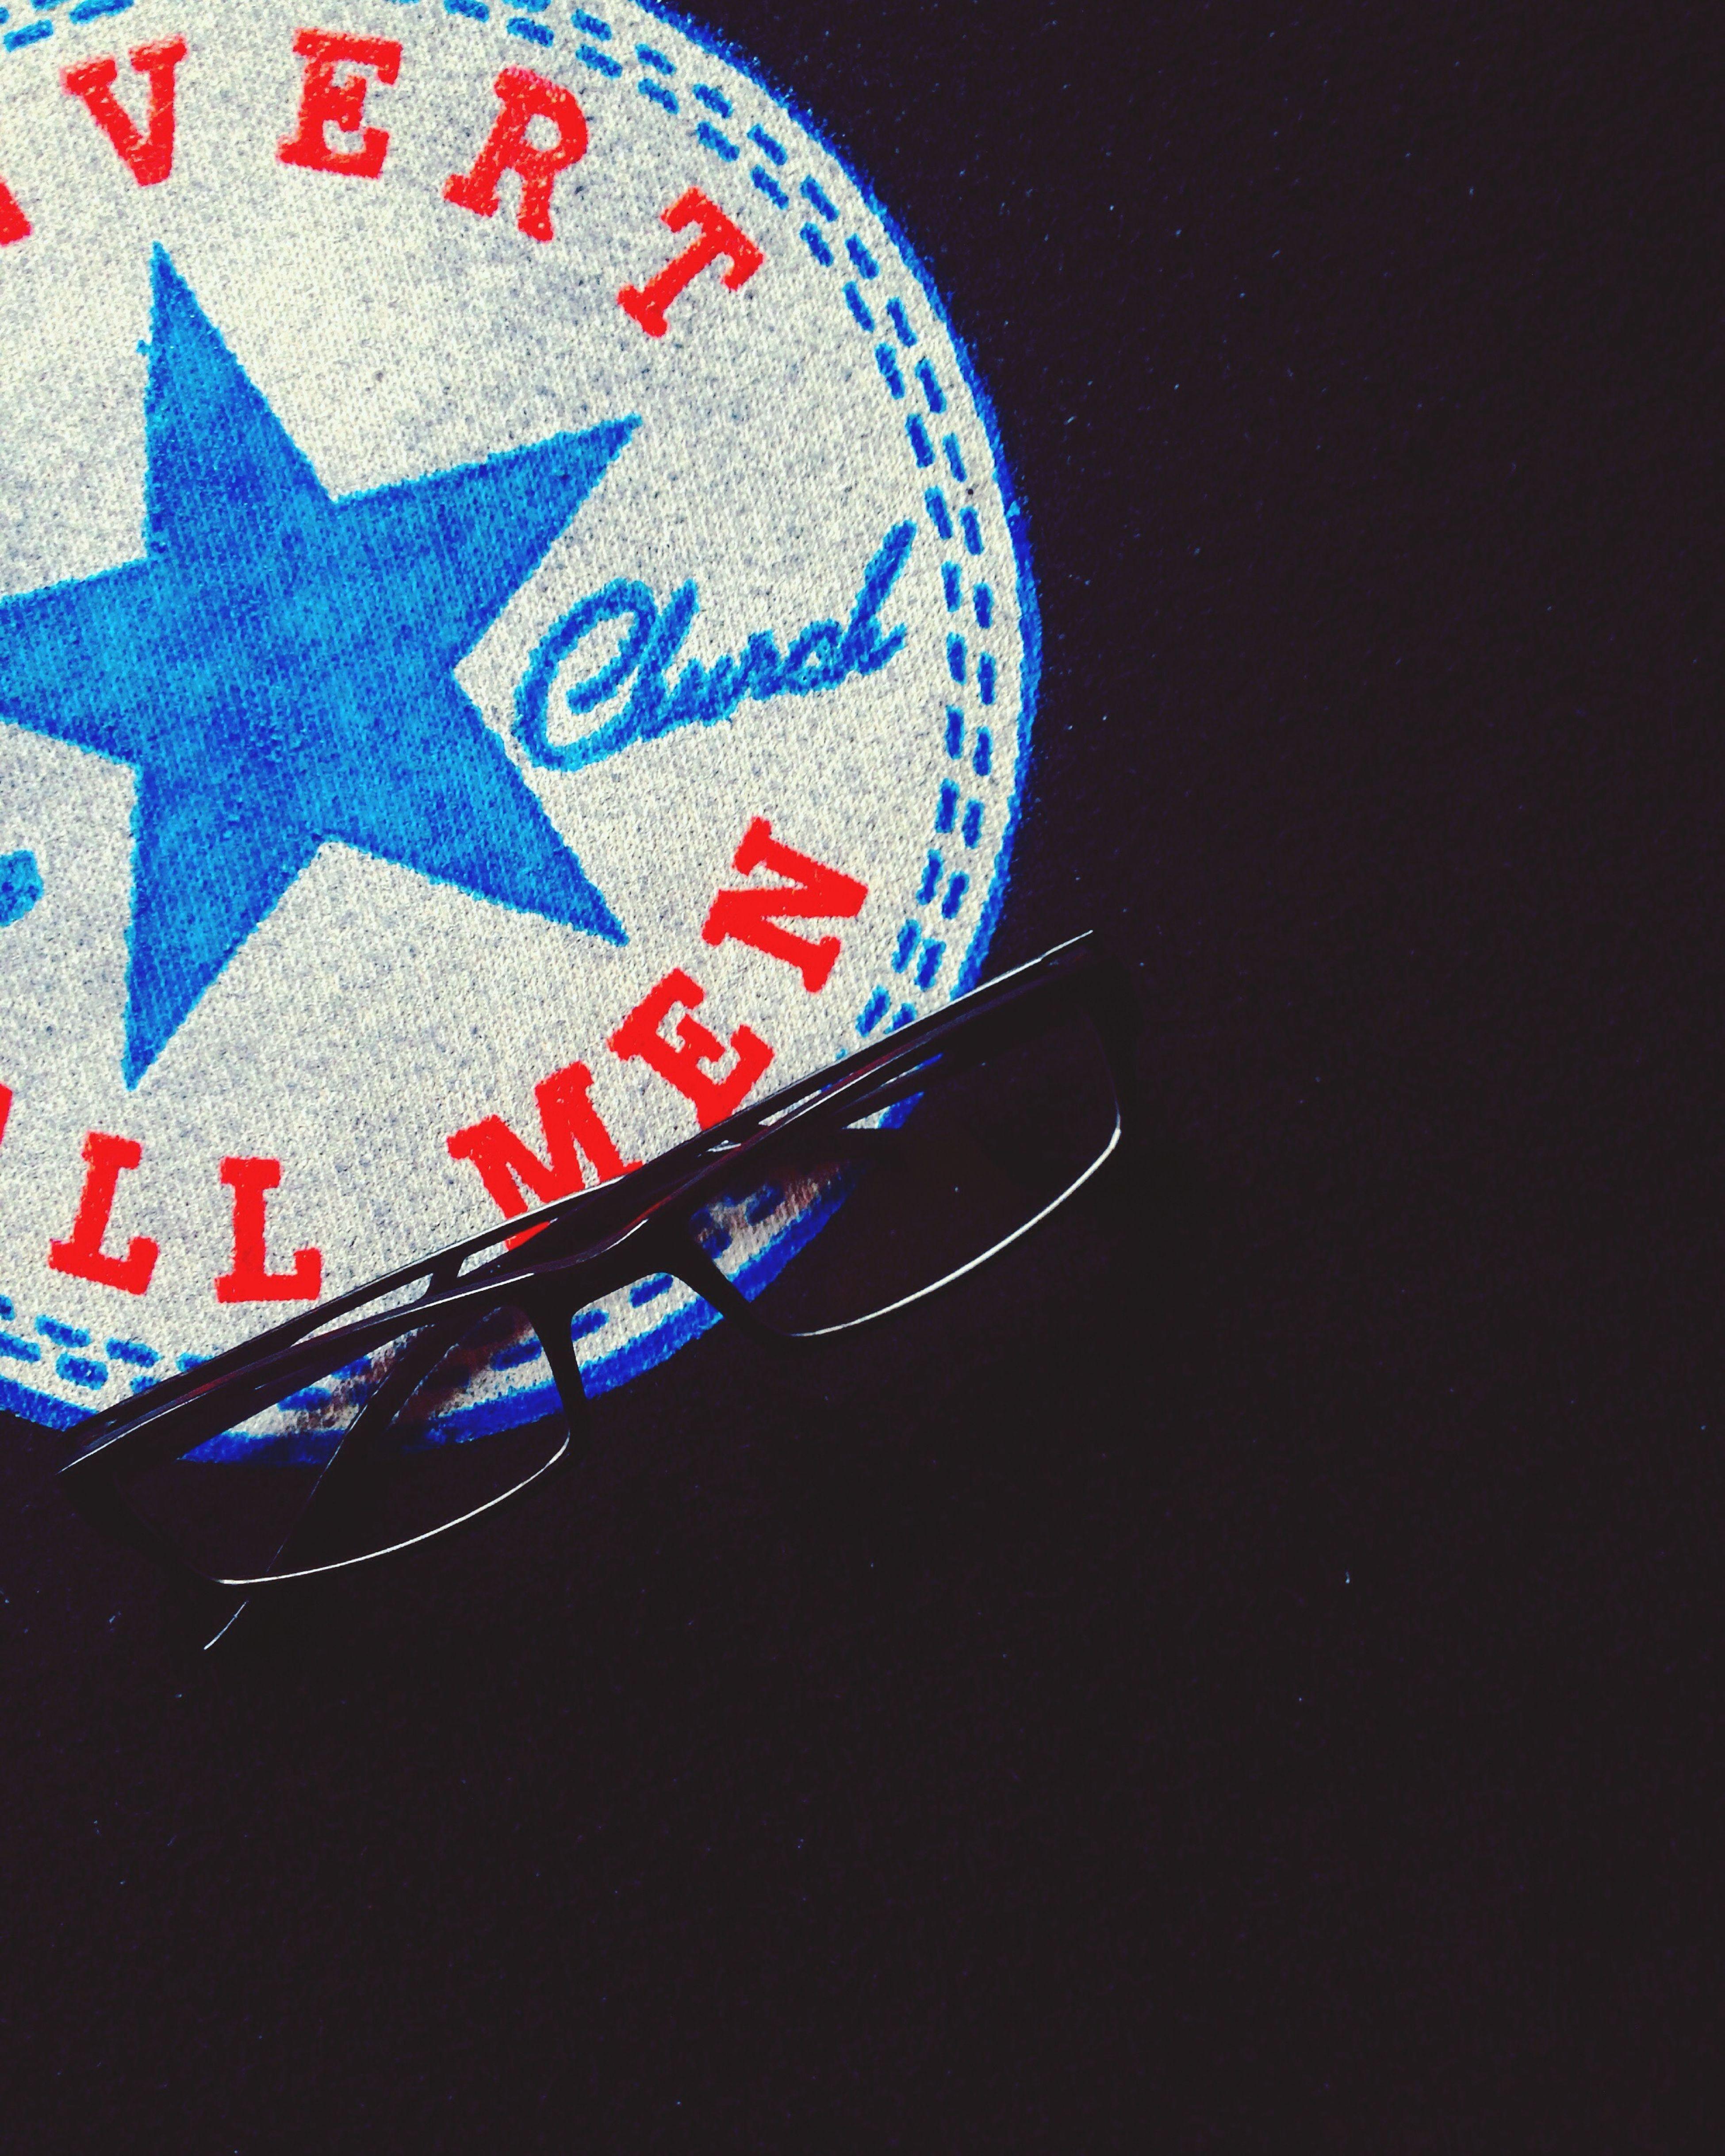 Convert all men. Personalized shirt 👍🏻 Convertallmen Prints Sweater Convert Chucktaylor Version Alltheneonlights Neon Lights Neonblue Neonred Logo Design Logo IPhoneography Tees Inspired Showcase: February EyeEm Best Shots Iphonography EyeemPhilippines